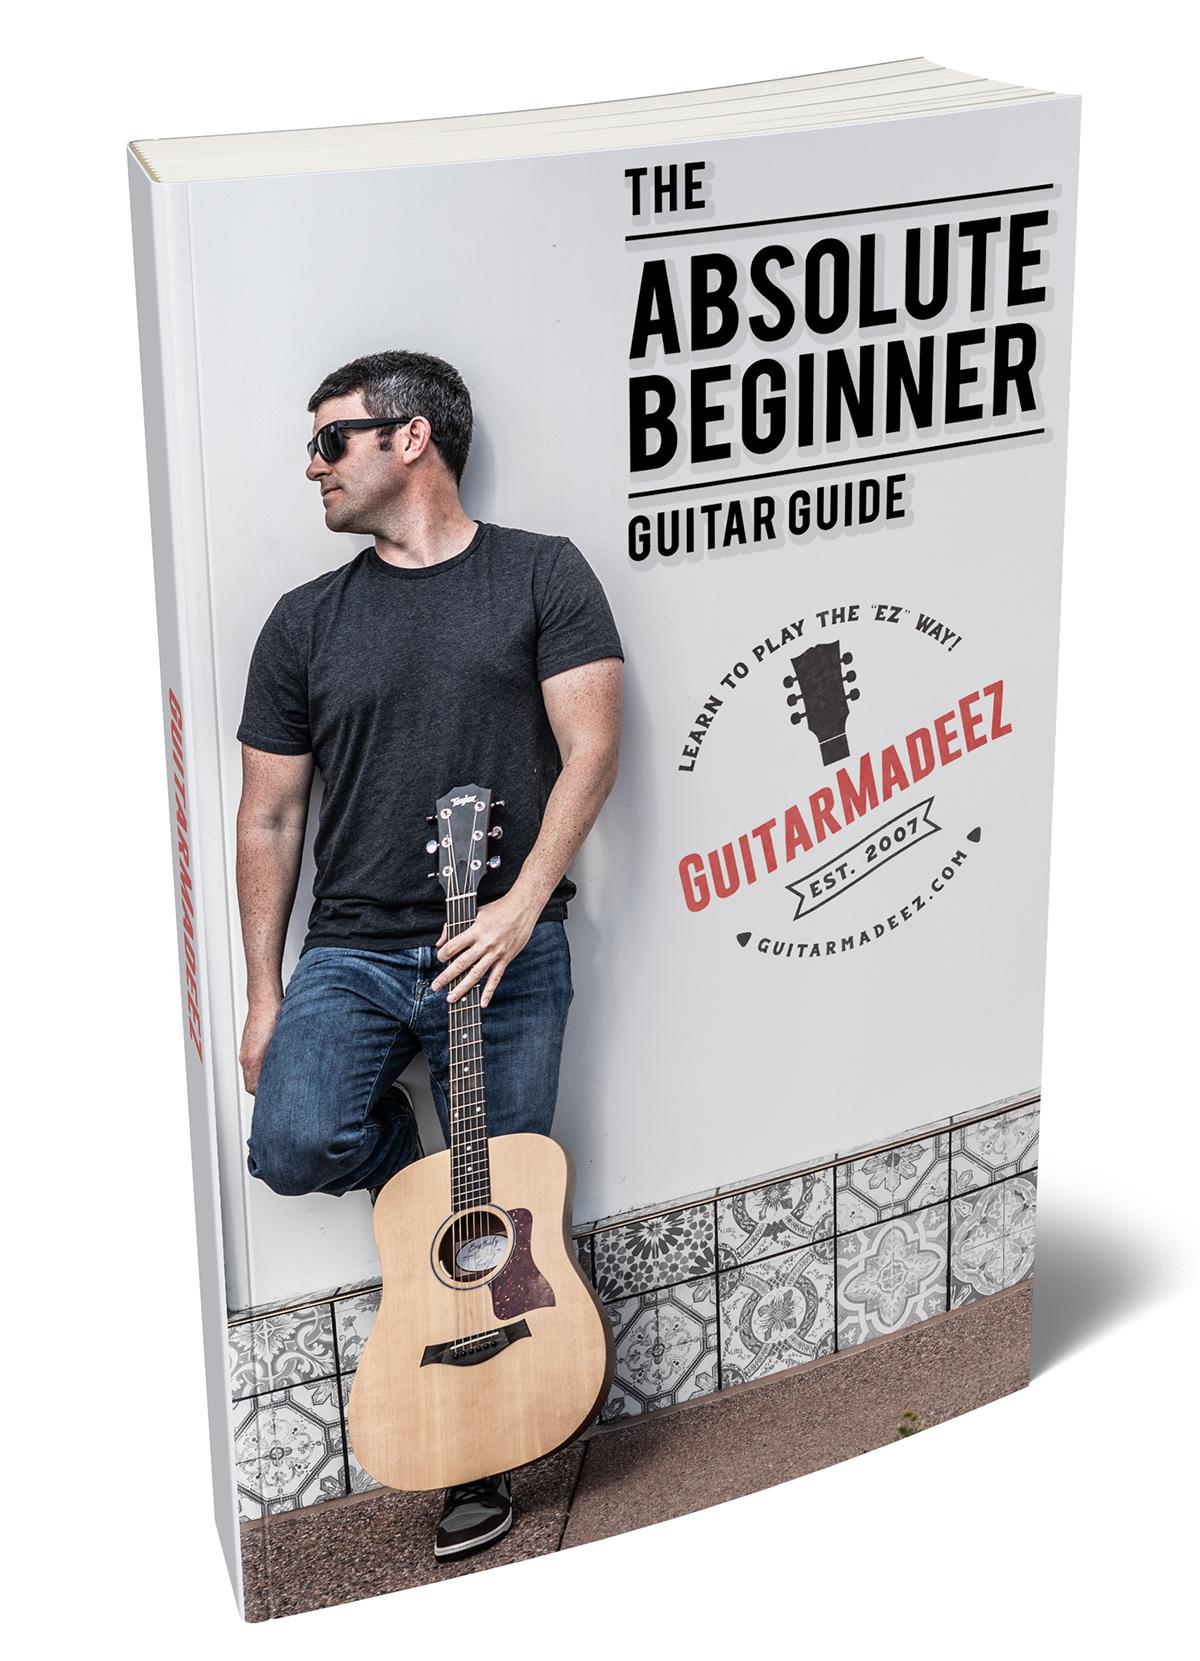 The Absolute Beginner Guitar Guide